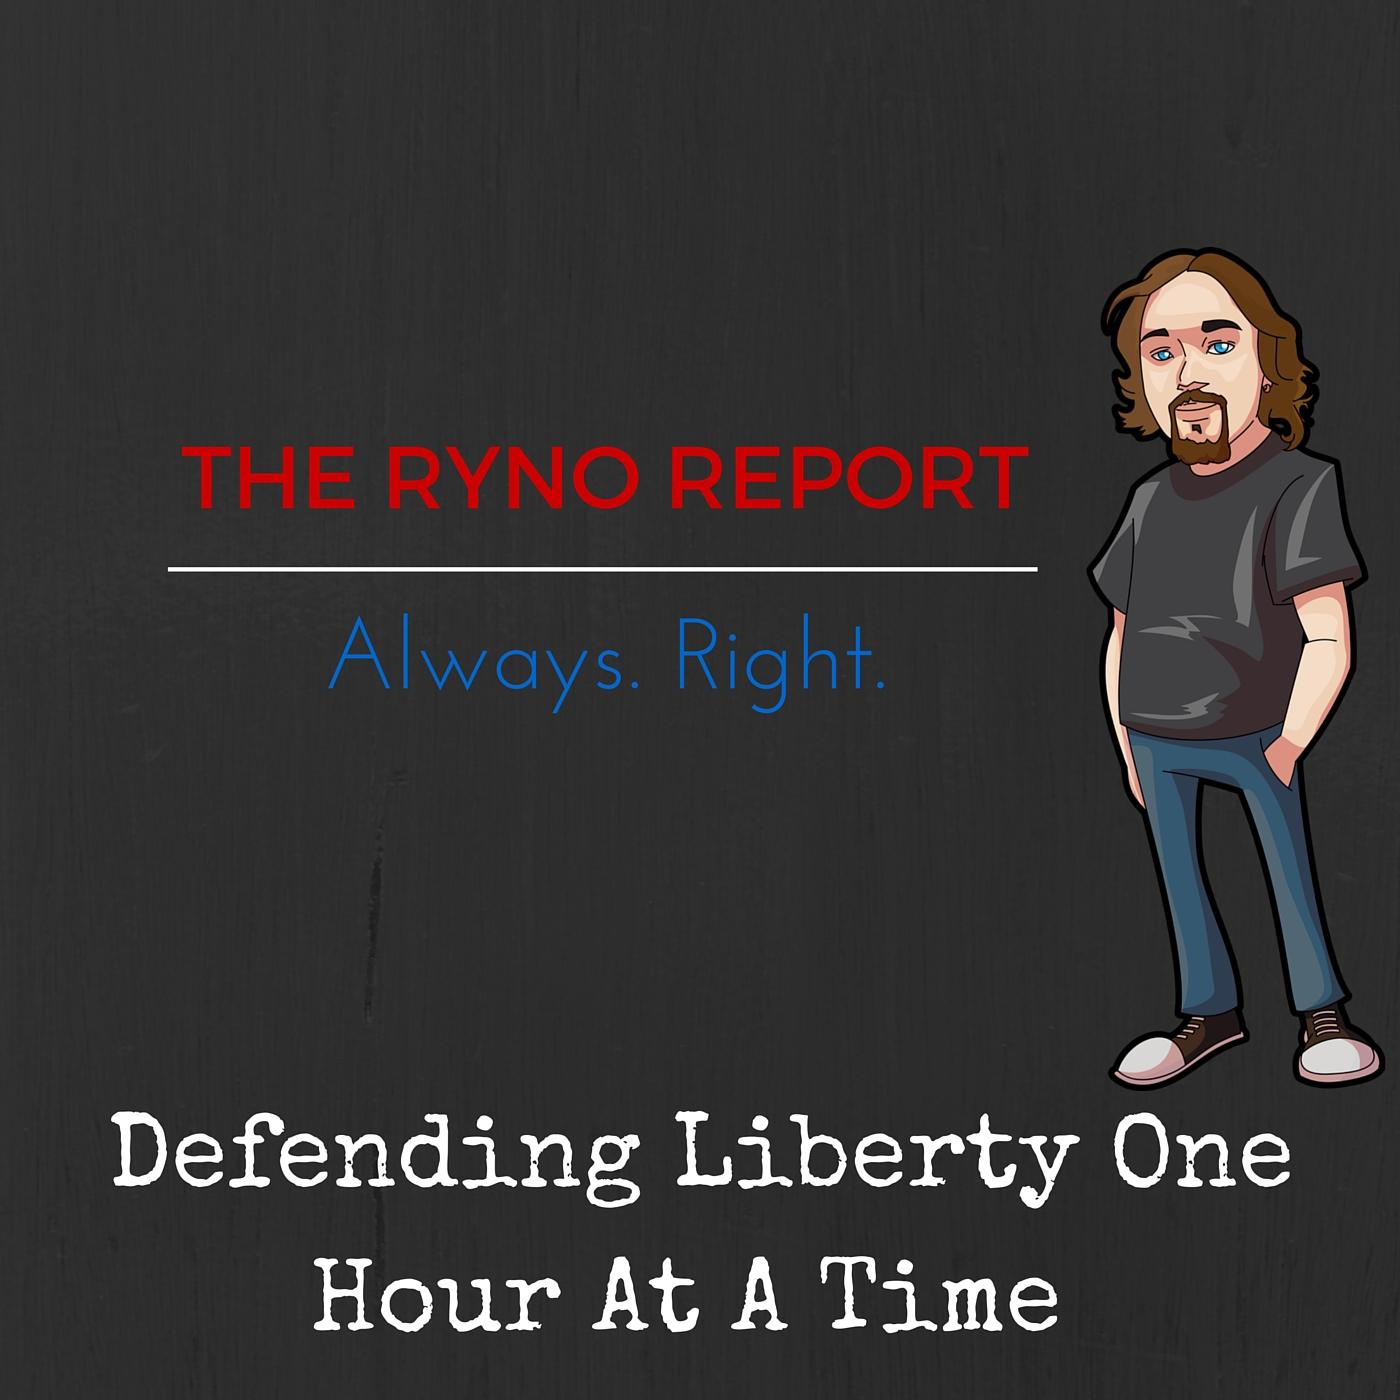 The Ryno Report